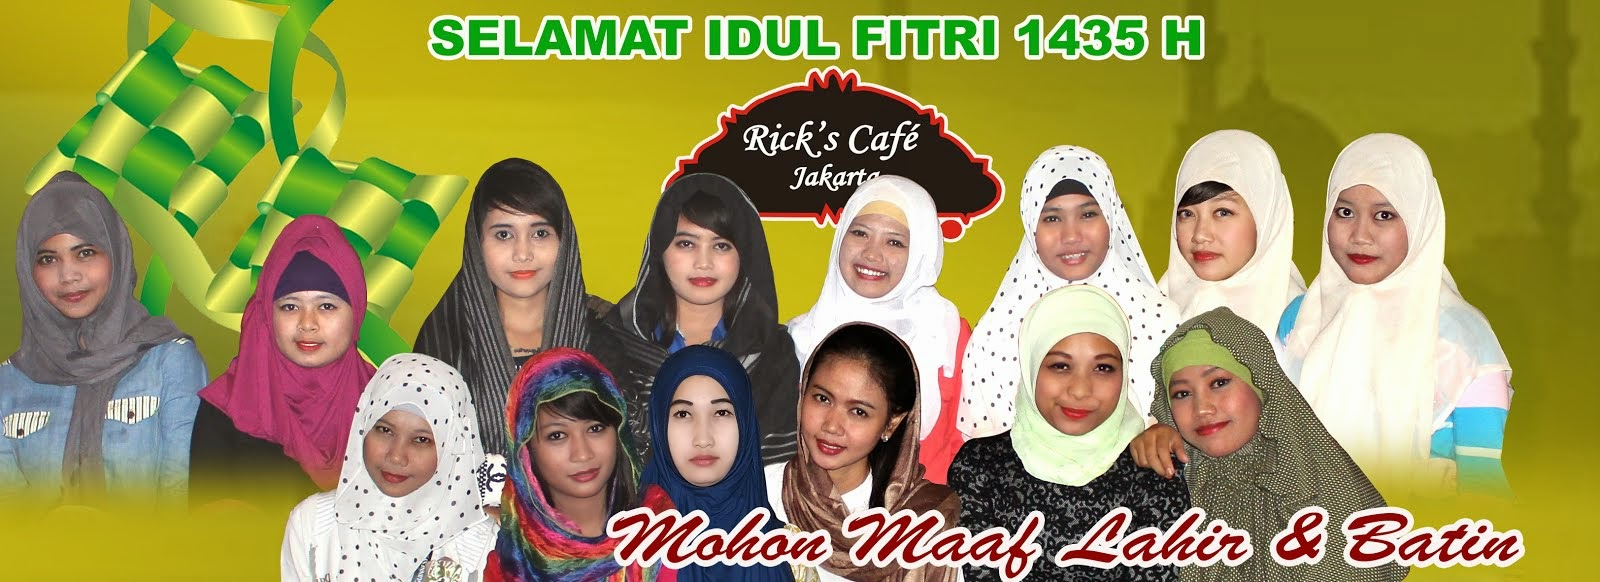 Selamat Idul Fitri 2014